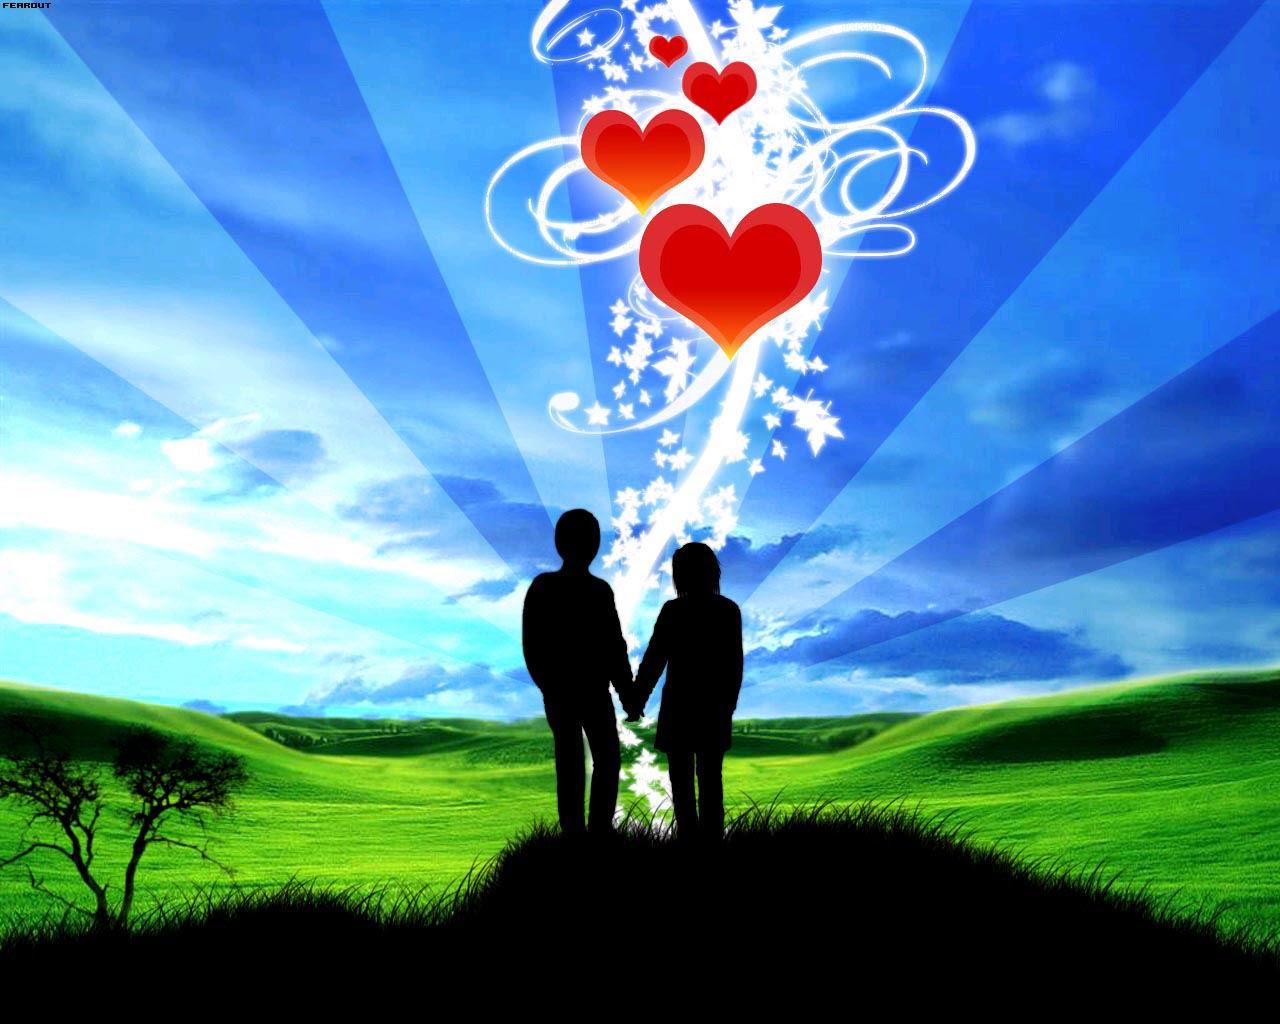 http://www.stunningmesh.com/wp-content/uploads/2011/05/stunningmesh-lov-wallpapers-large3.jpg